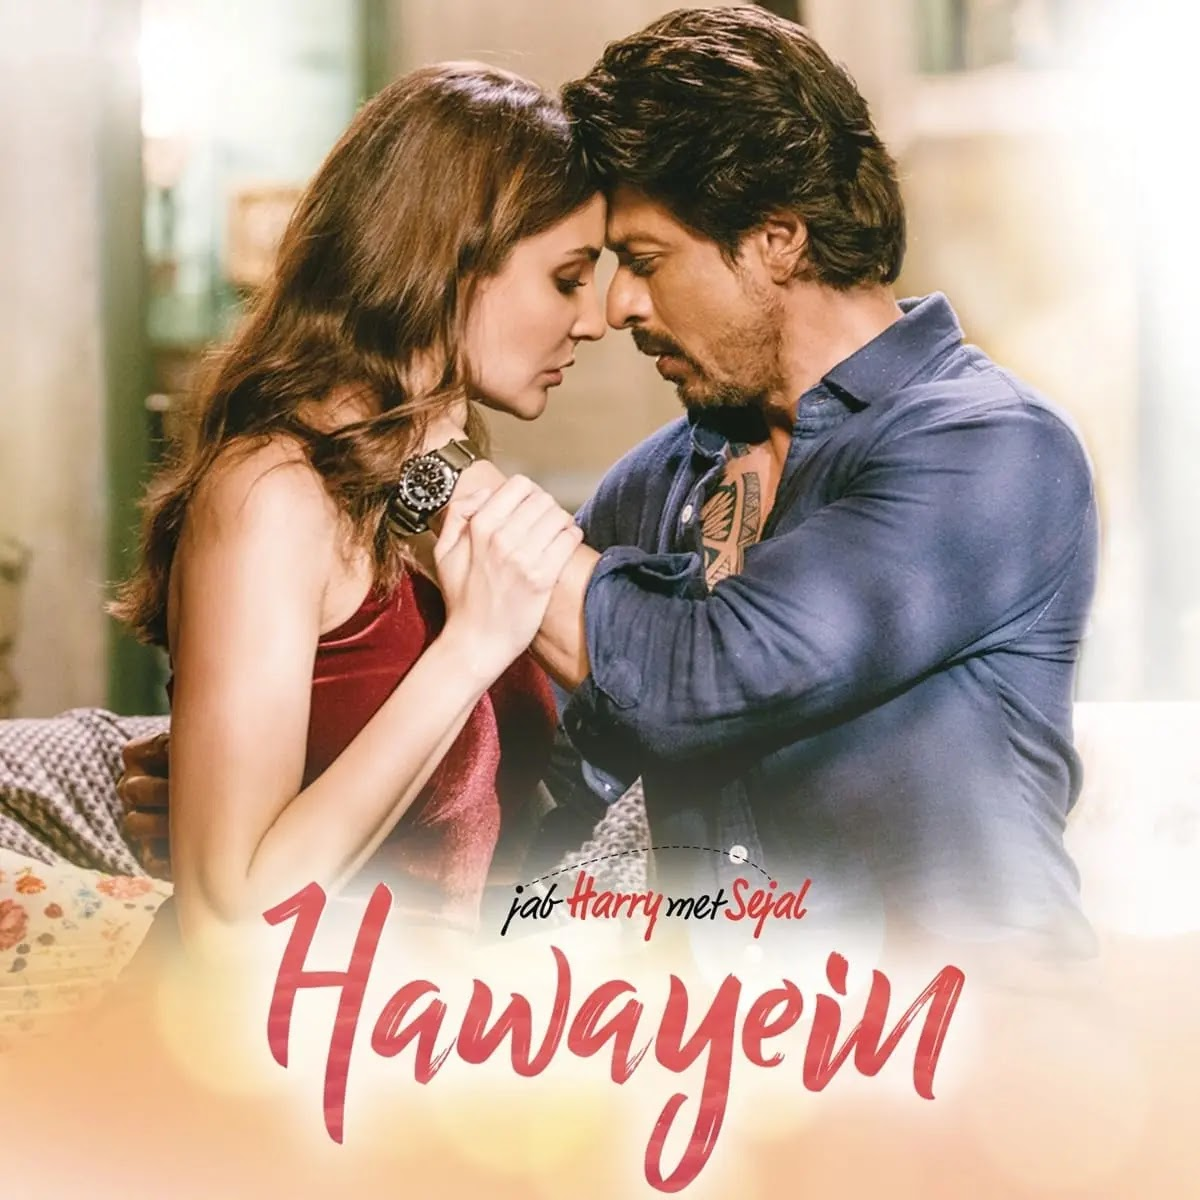 Le Jaye Jaane Kahan Hawayein Shahrukh Khan Mp3 Download 320kbps